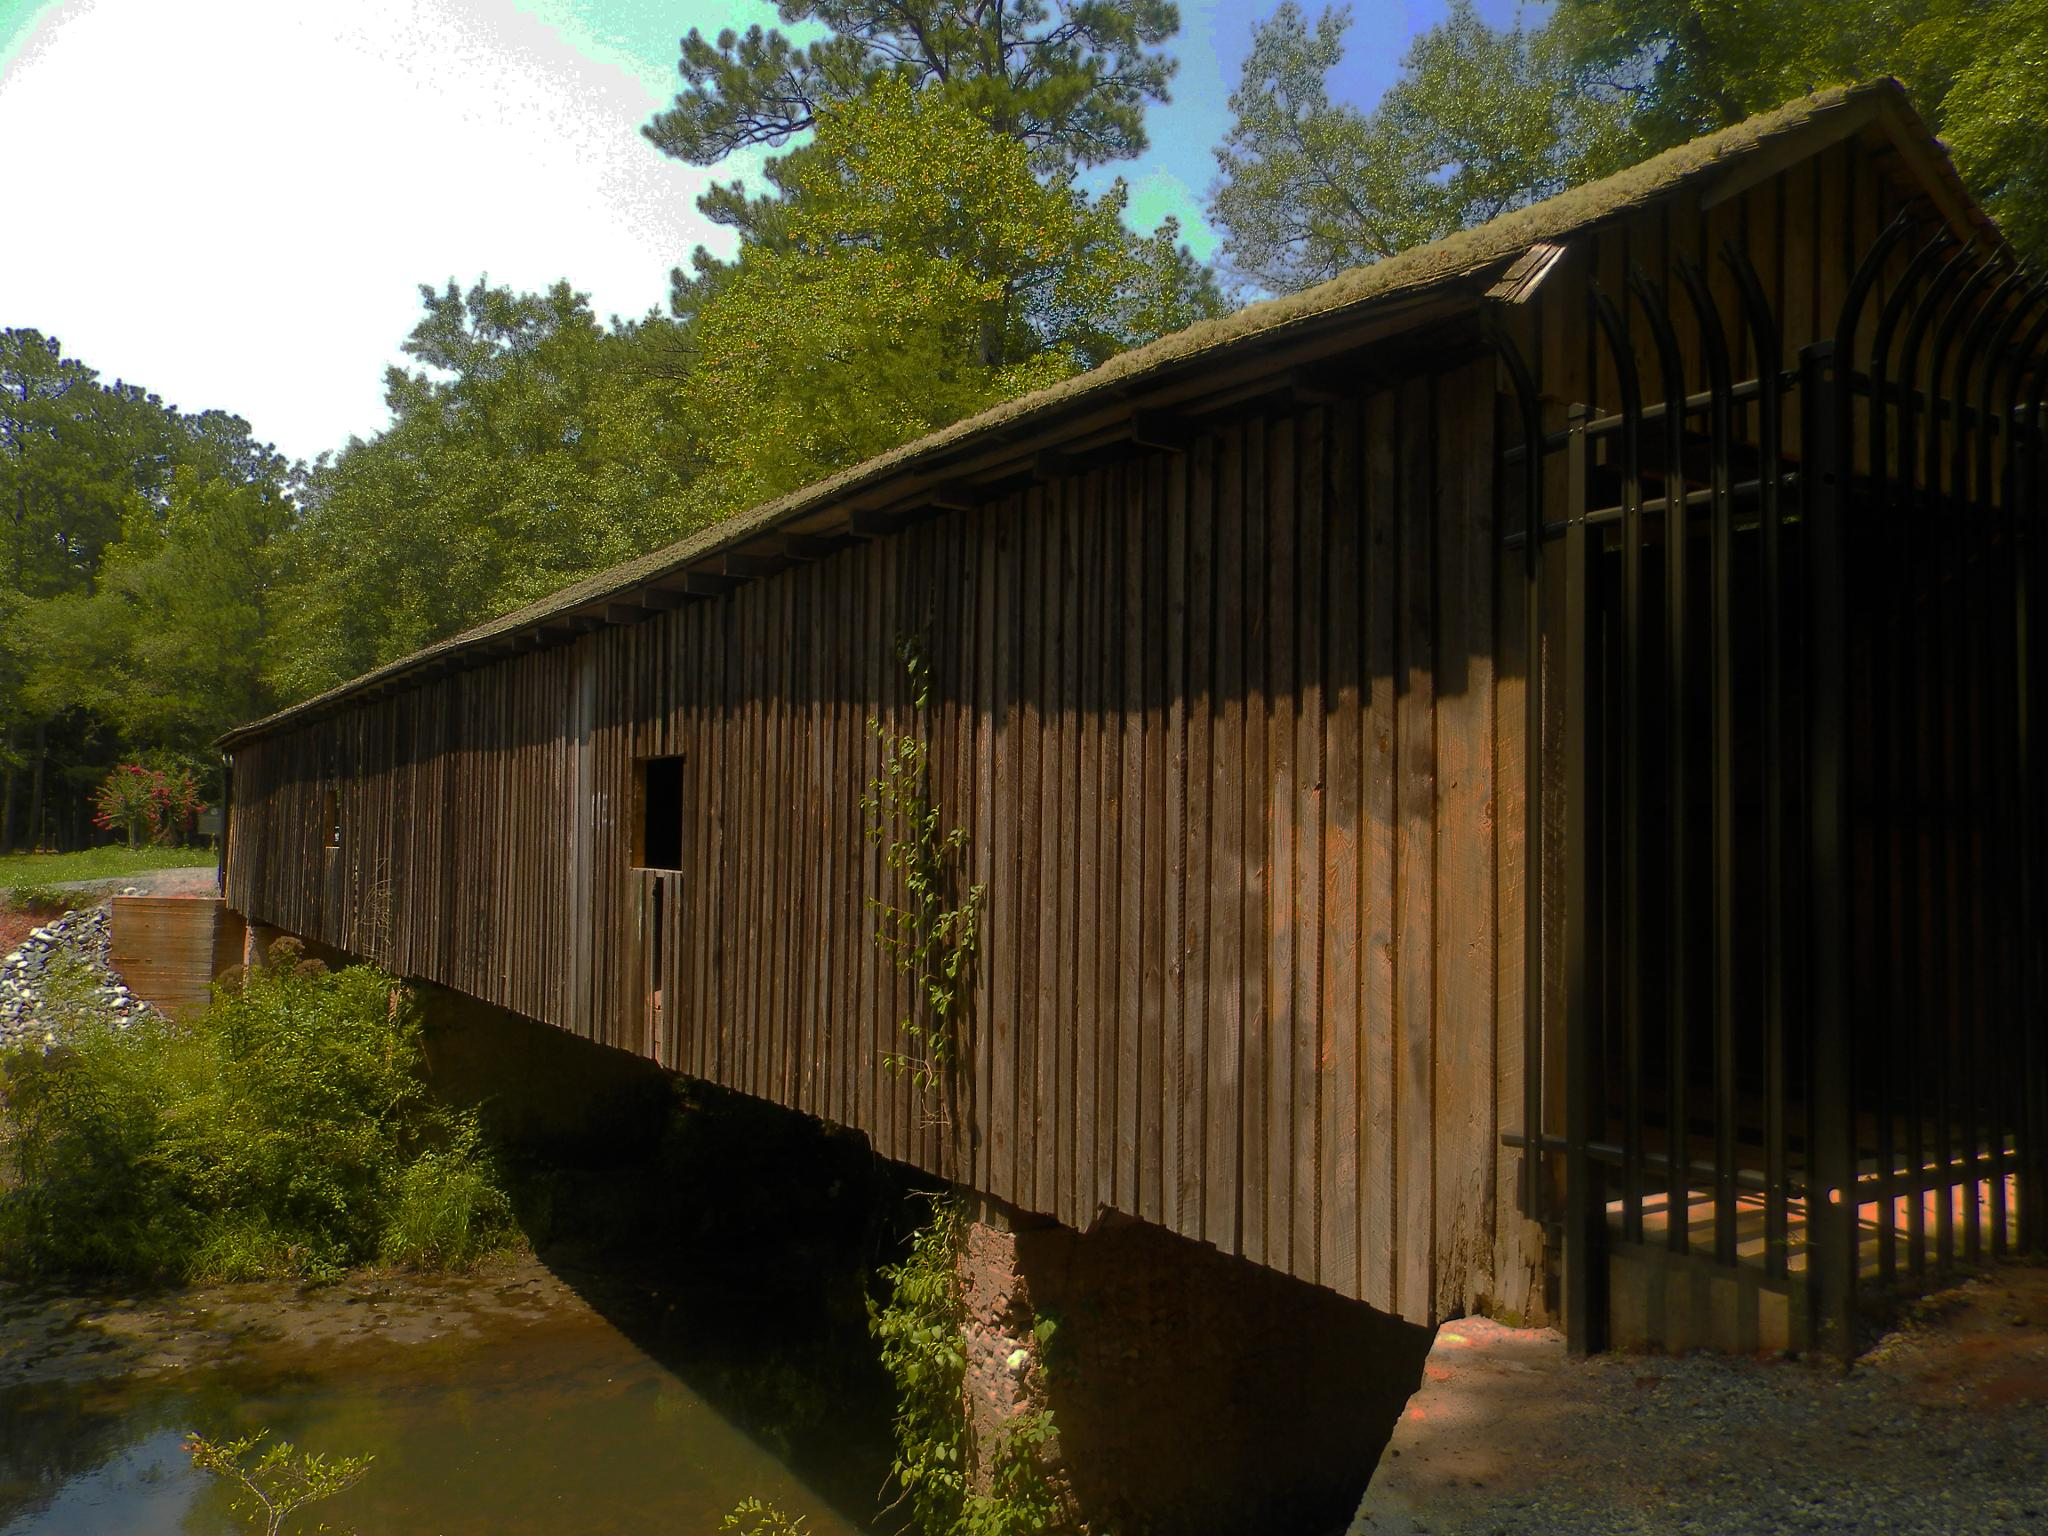 Coleekee Covered Bridge by evelyn.vinson